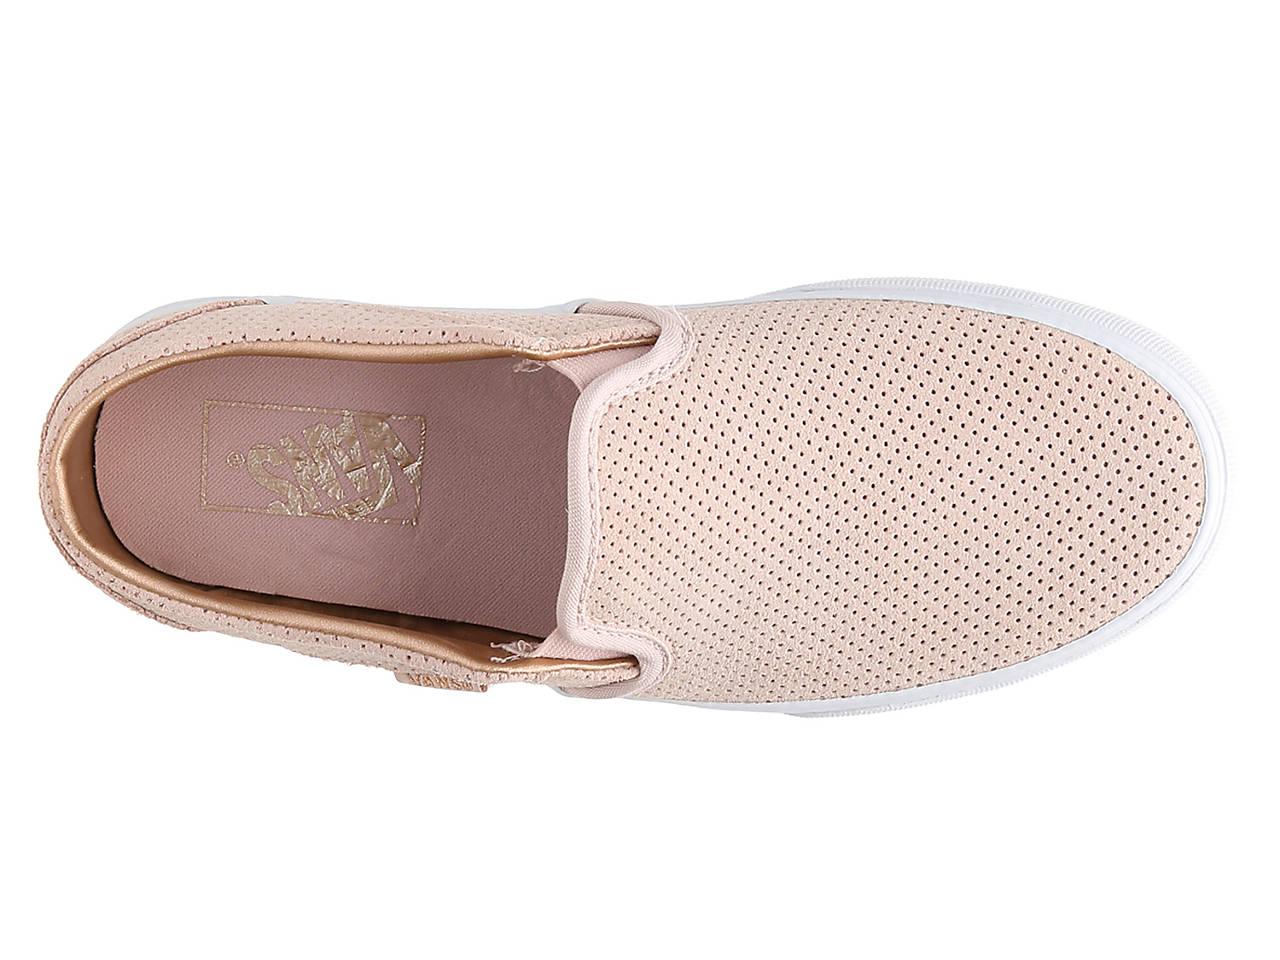 Vans Asher Perforated Slip-On Sneaker - Women s Women s Shoes  e0f7b7f2b